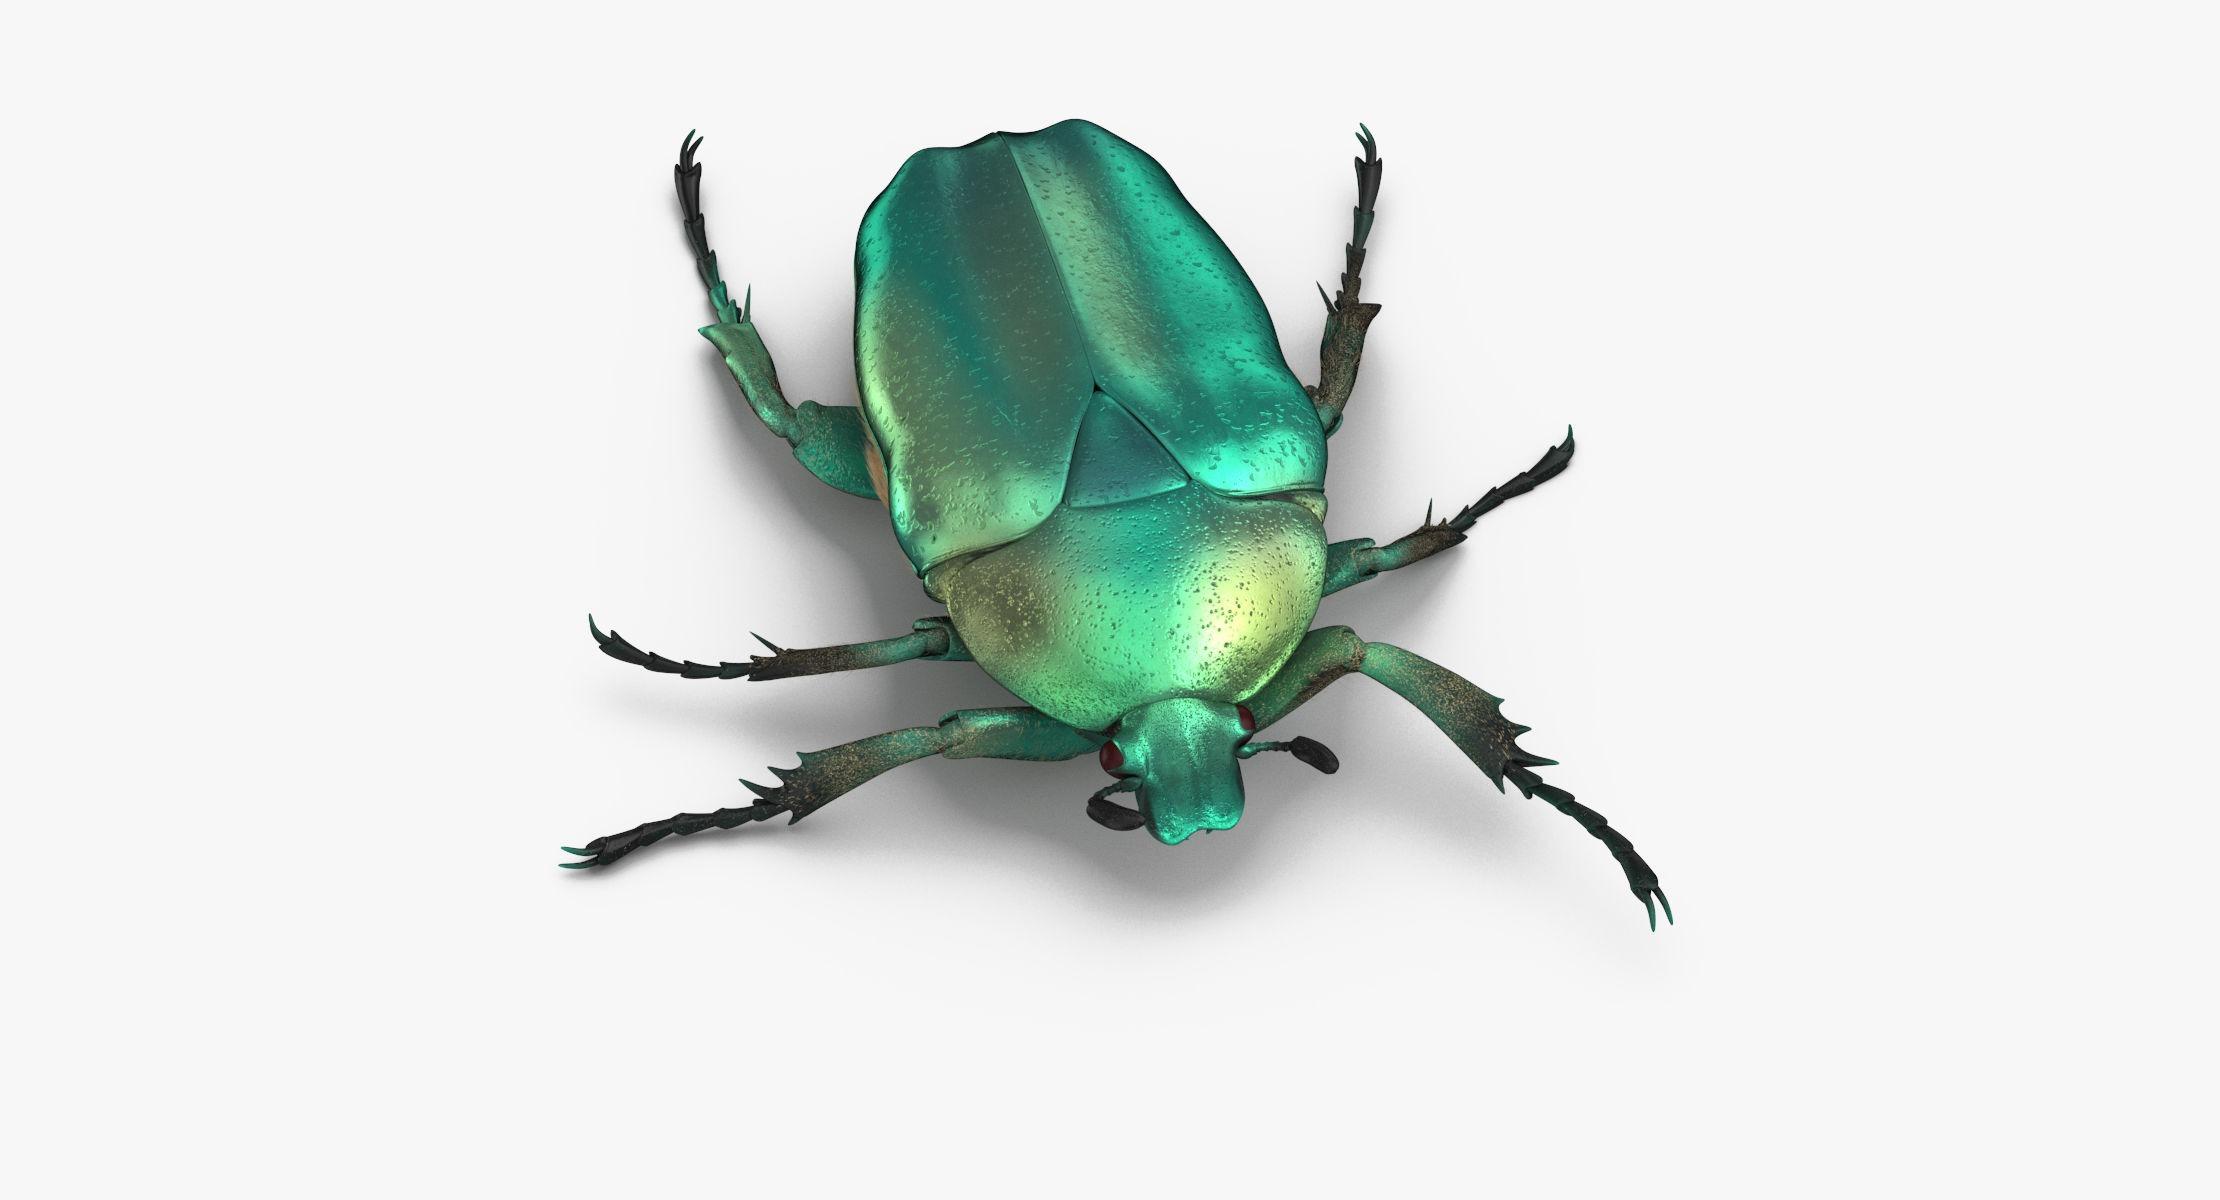 Green Scarab Beetle Walking 01 model - reel 1